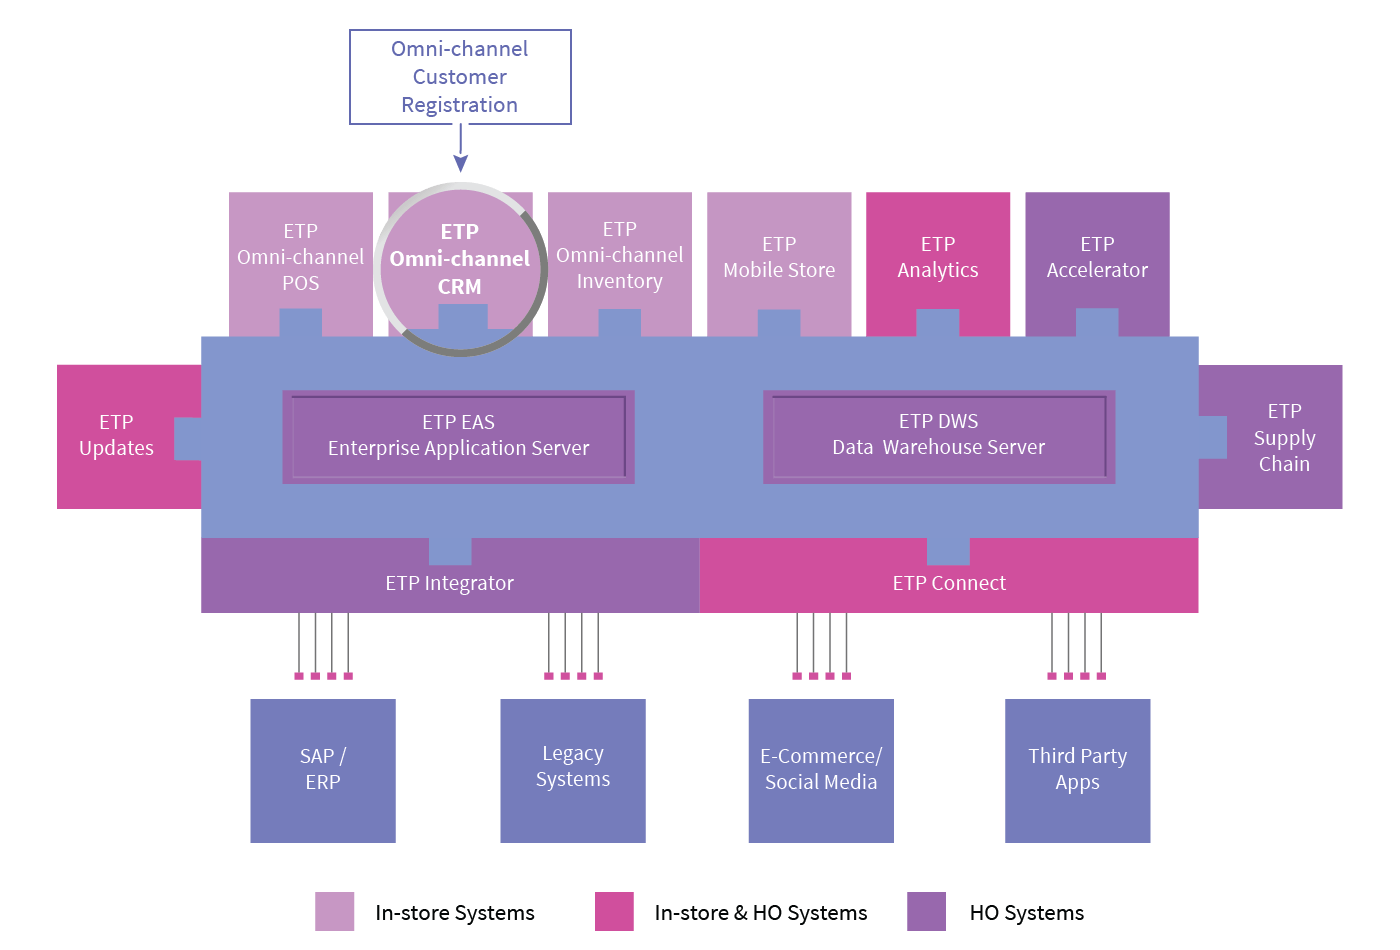 etp-omni-channel-crm-omni-channel-customer-registration